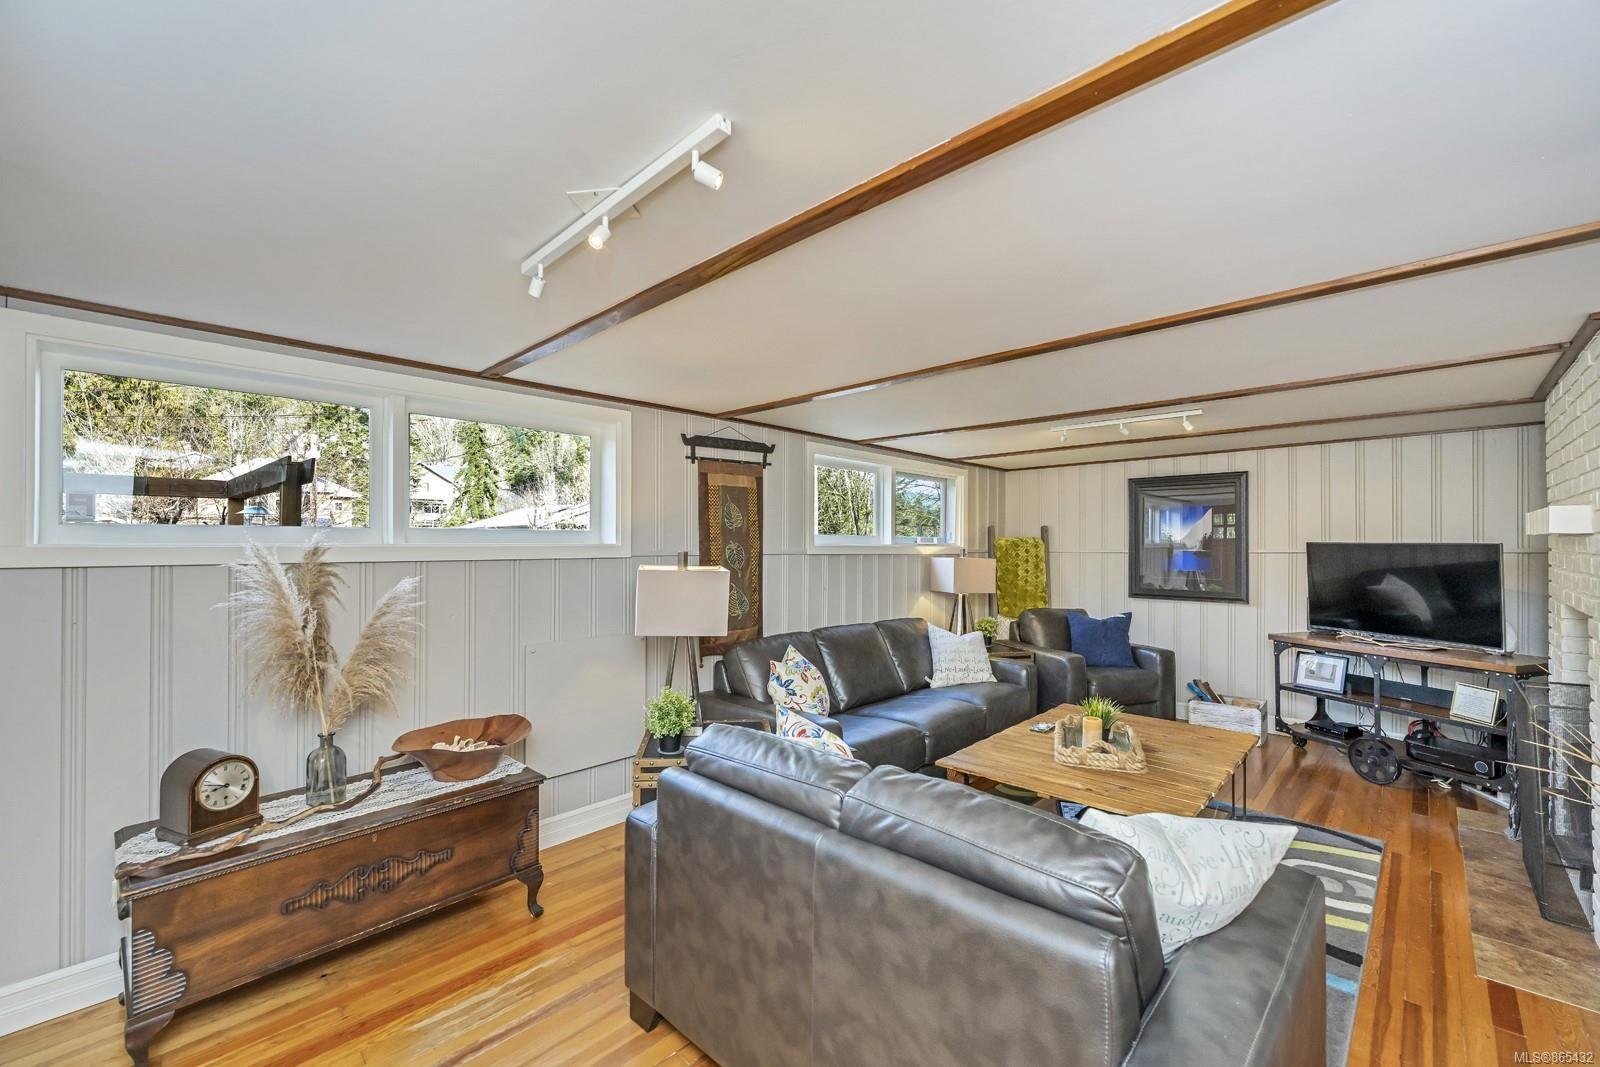 Photo 27: Photos: 6734 Drummond Dr in : Du East Duncan House for sale (Duncan)  : MLS®# 865432